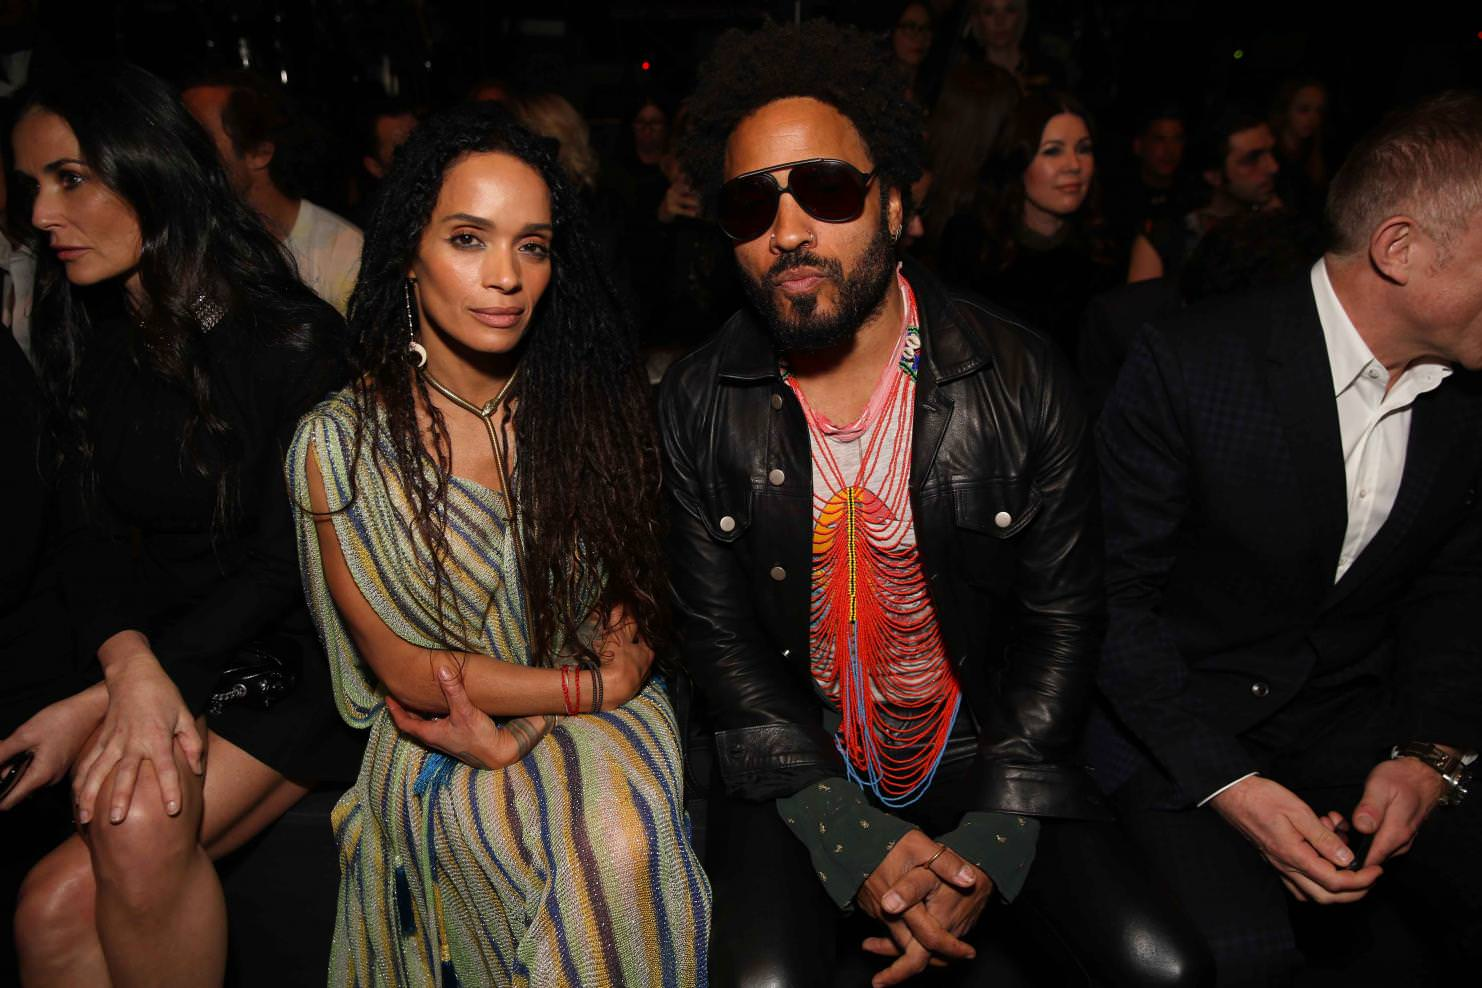 Lisa Bonnet and Lenny Kravitz